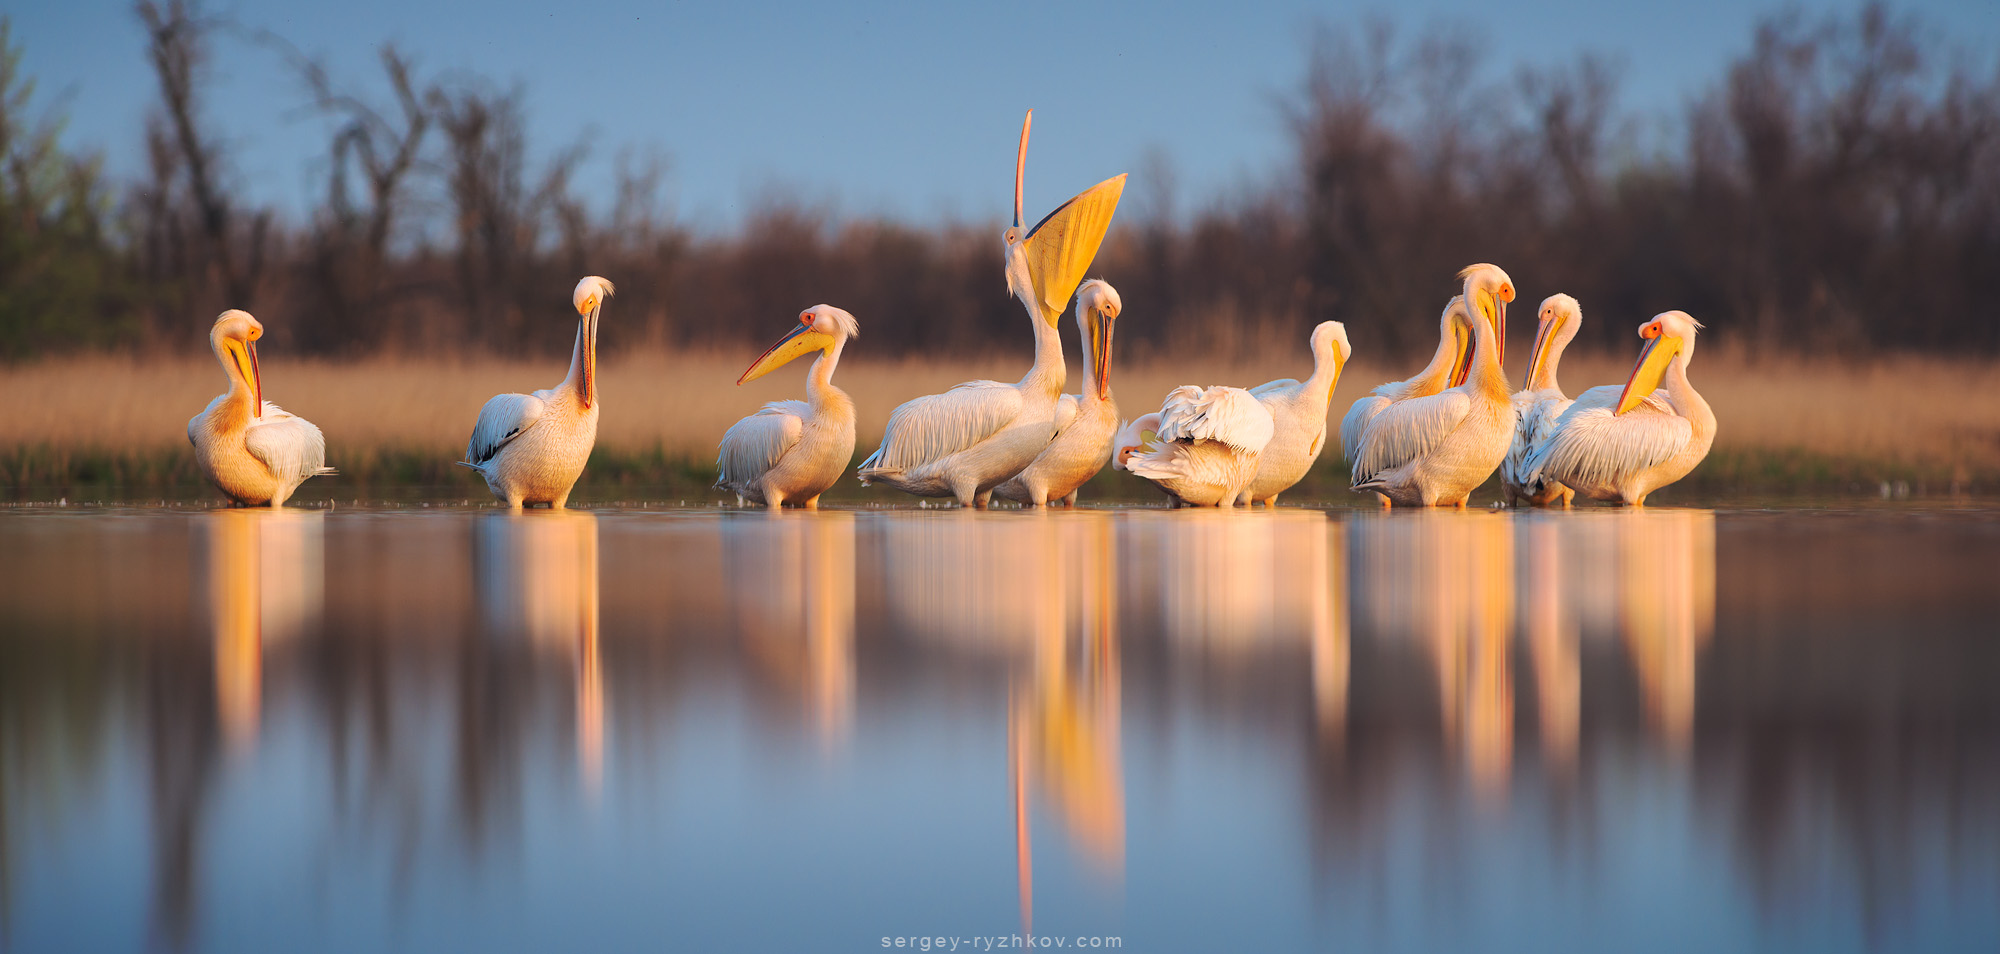 Pelicans by Sergey-Ryzhkov